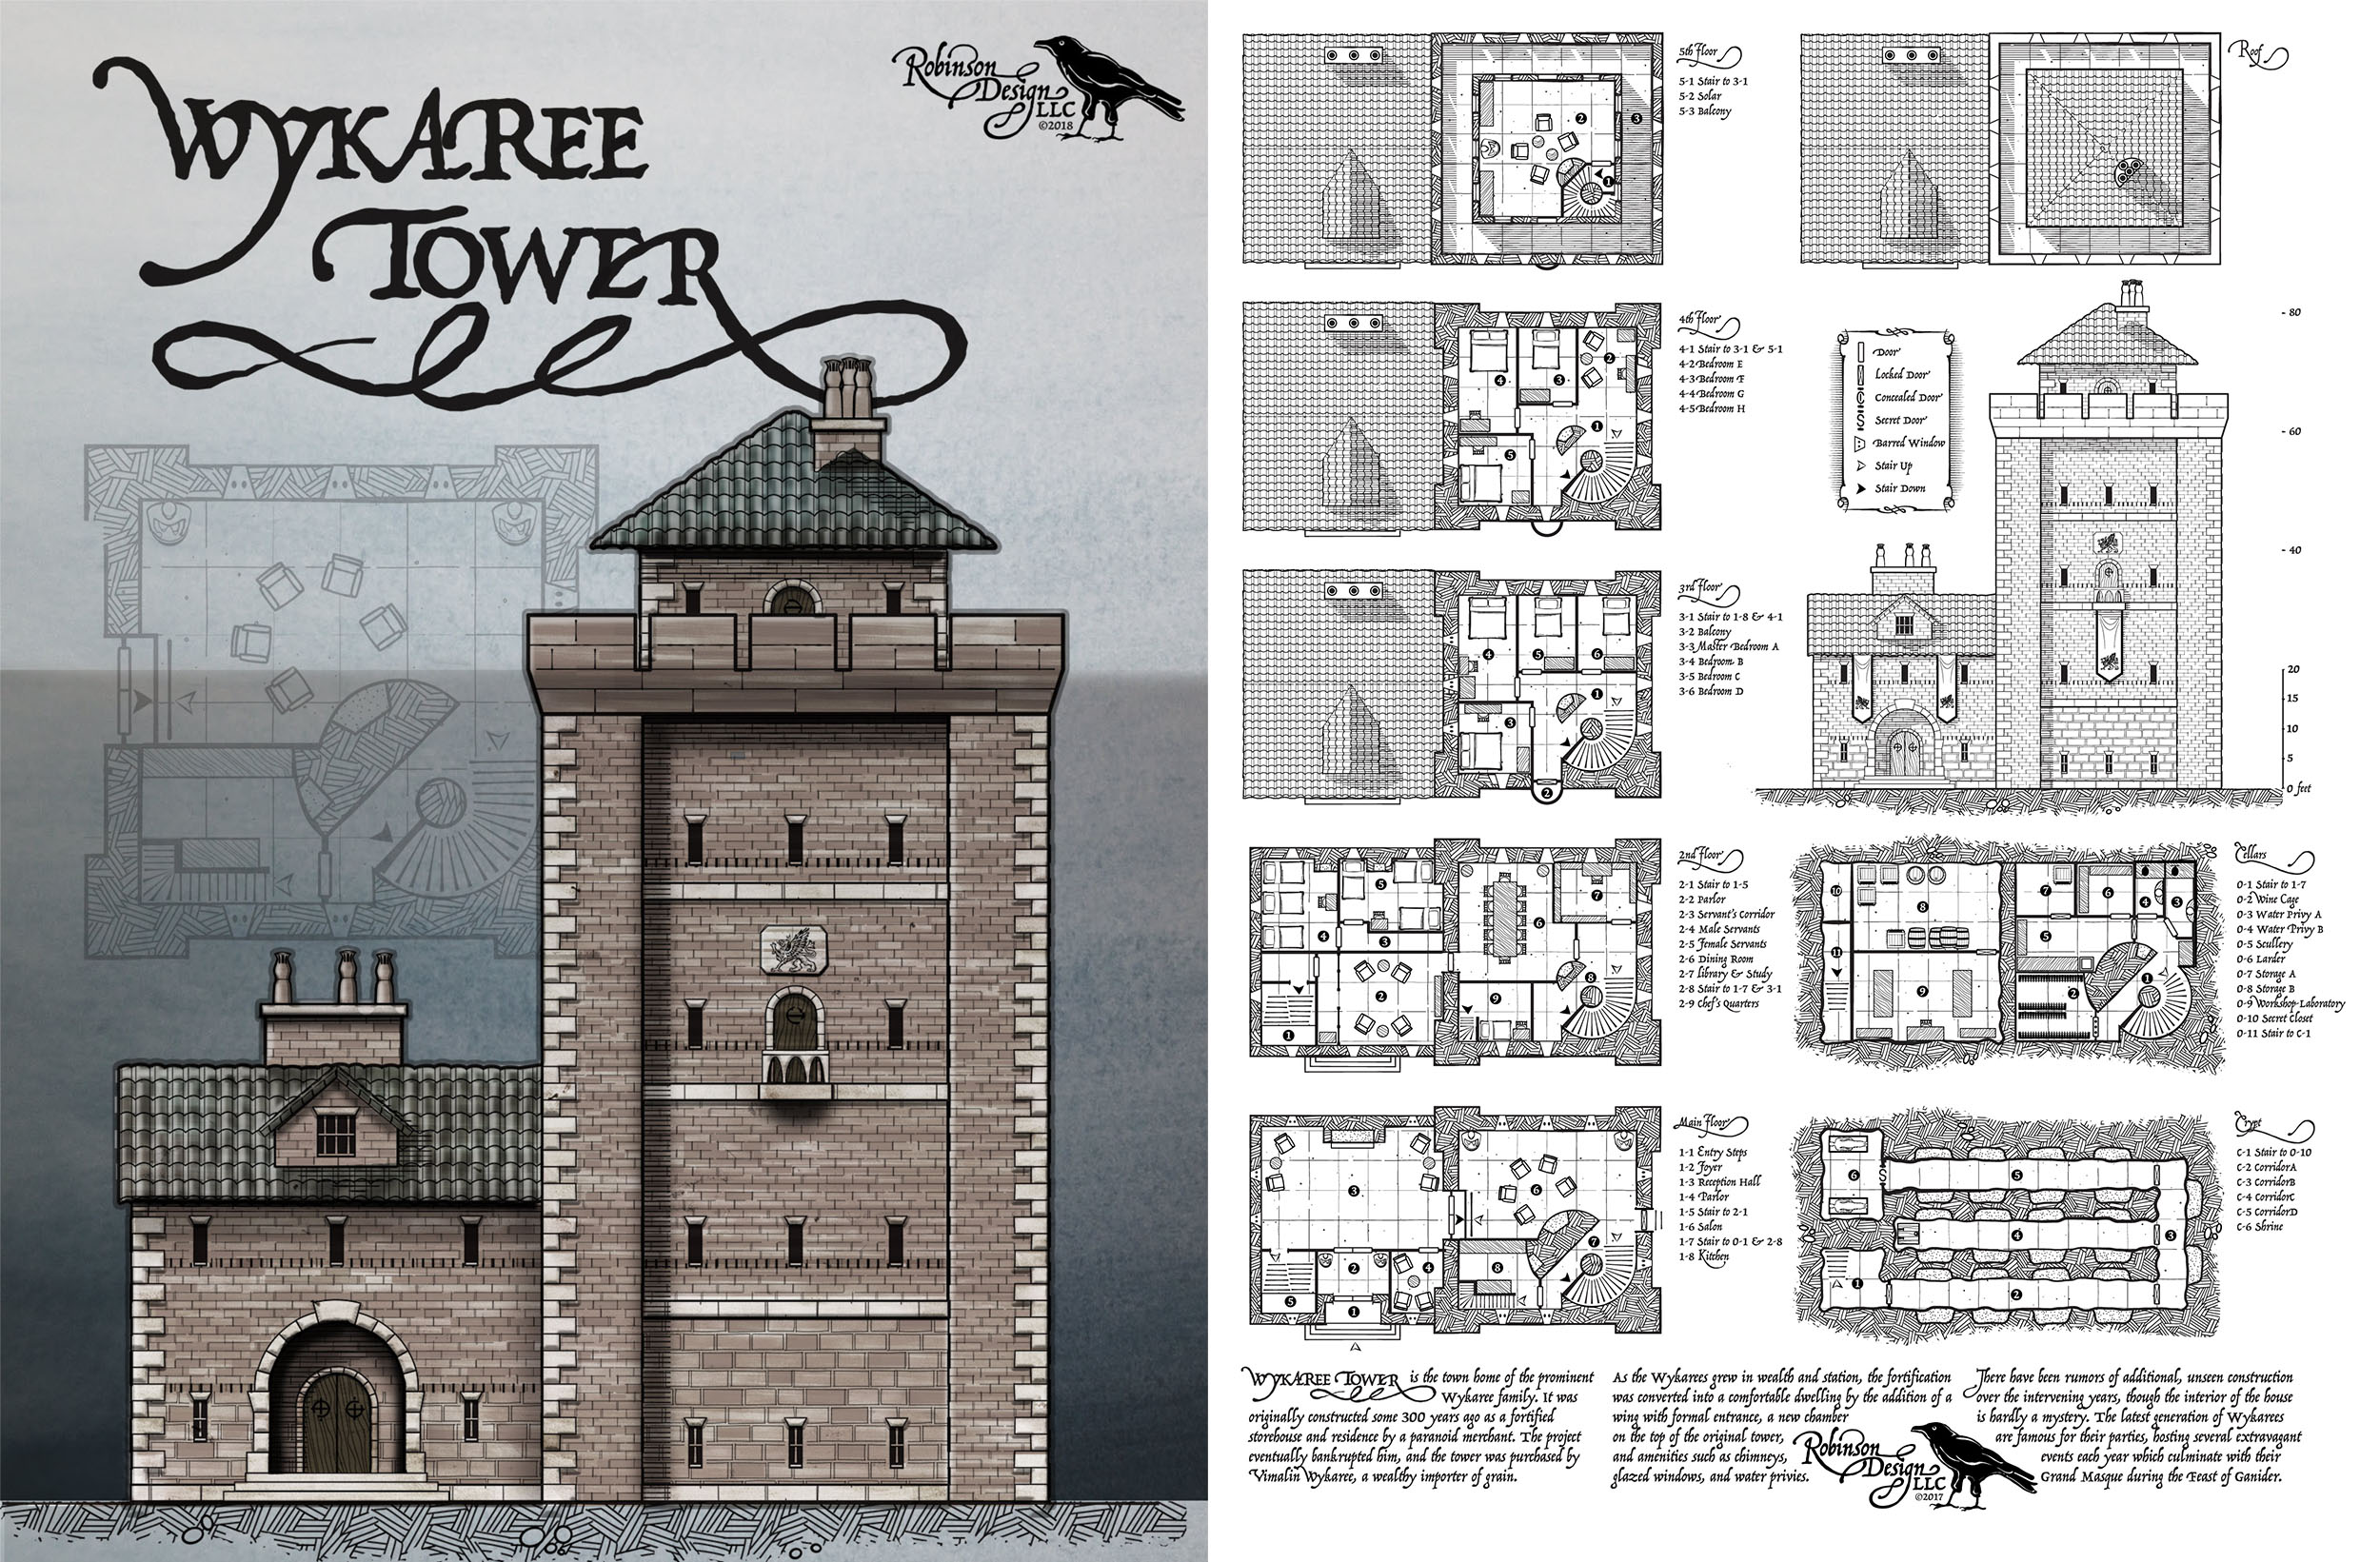 Wykaree Tower